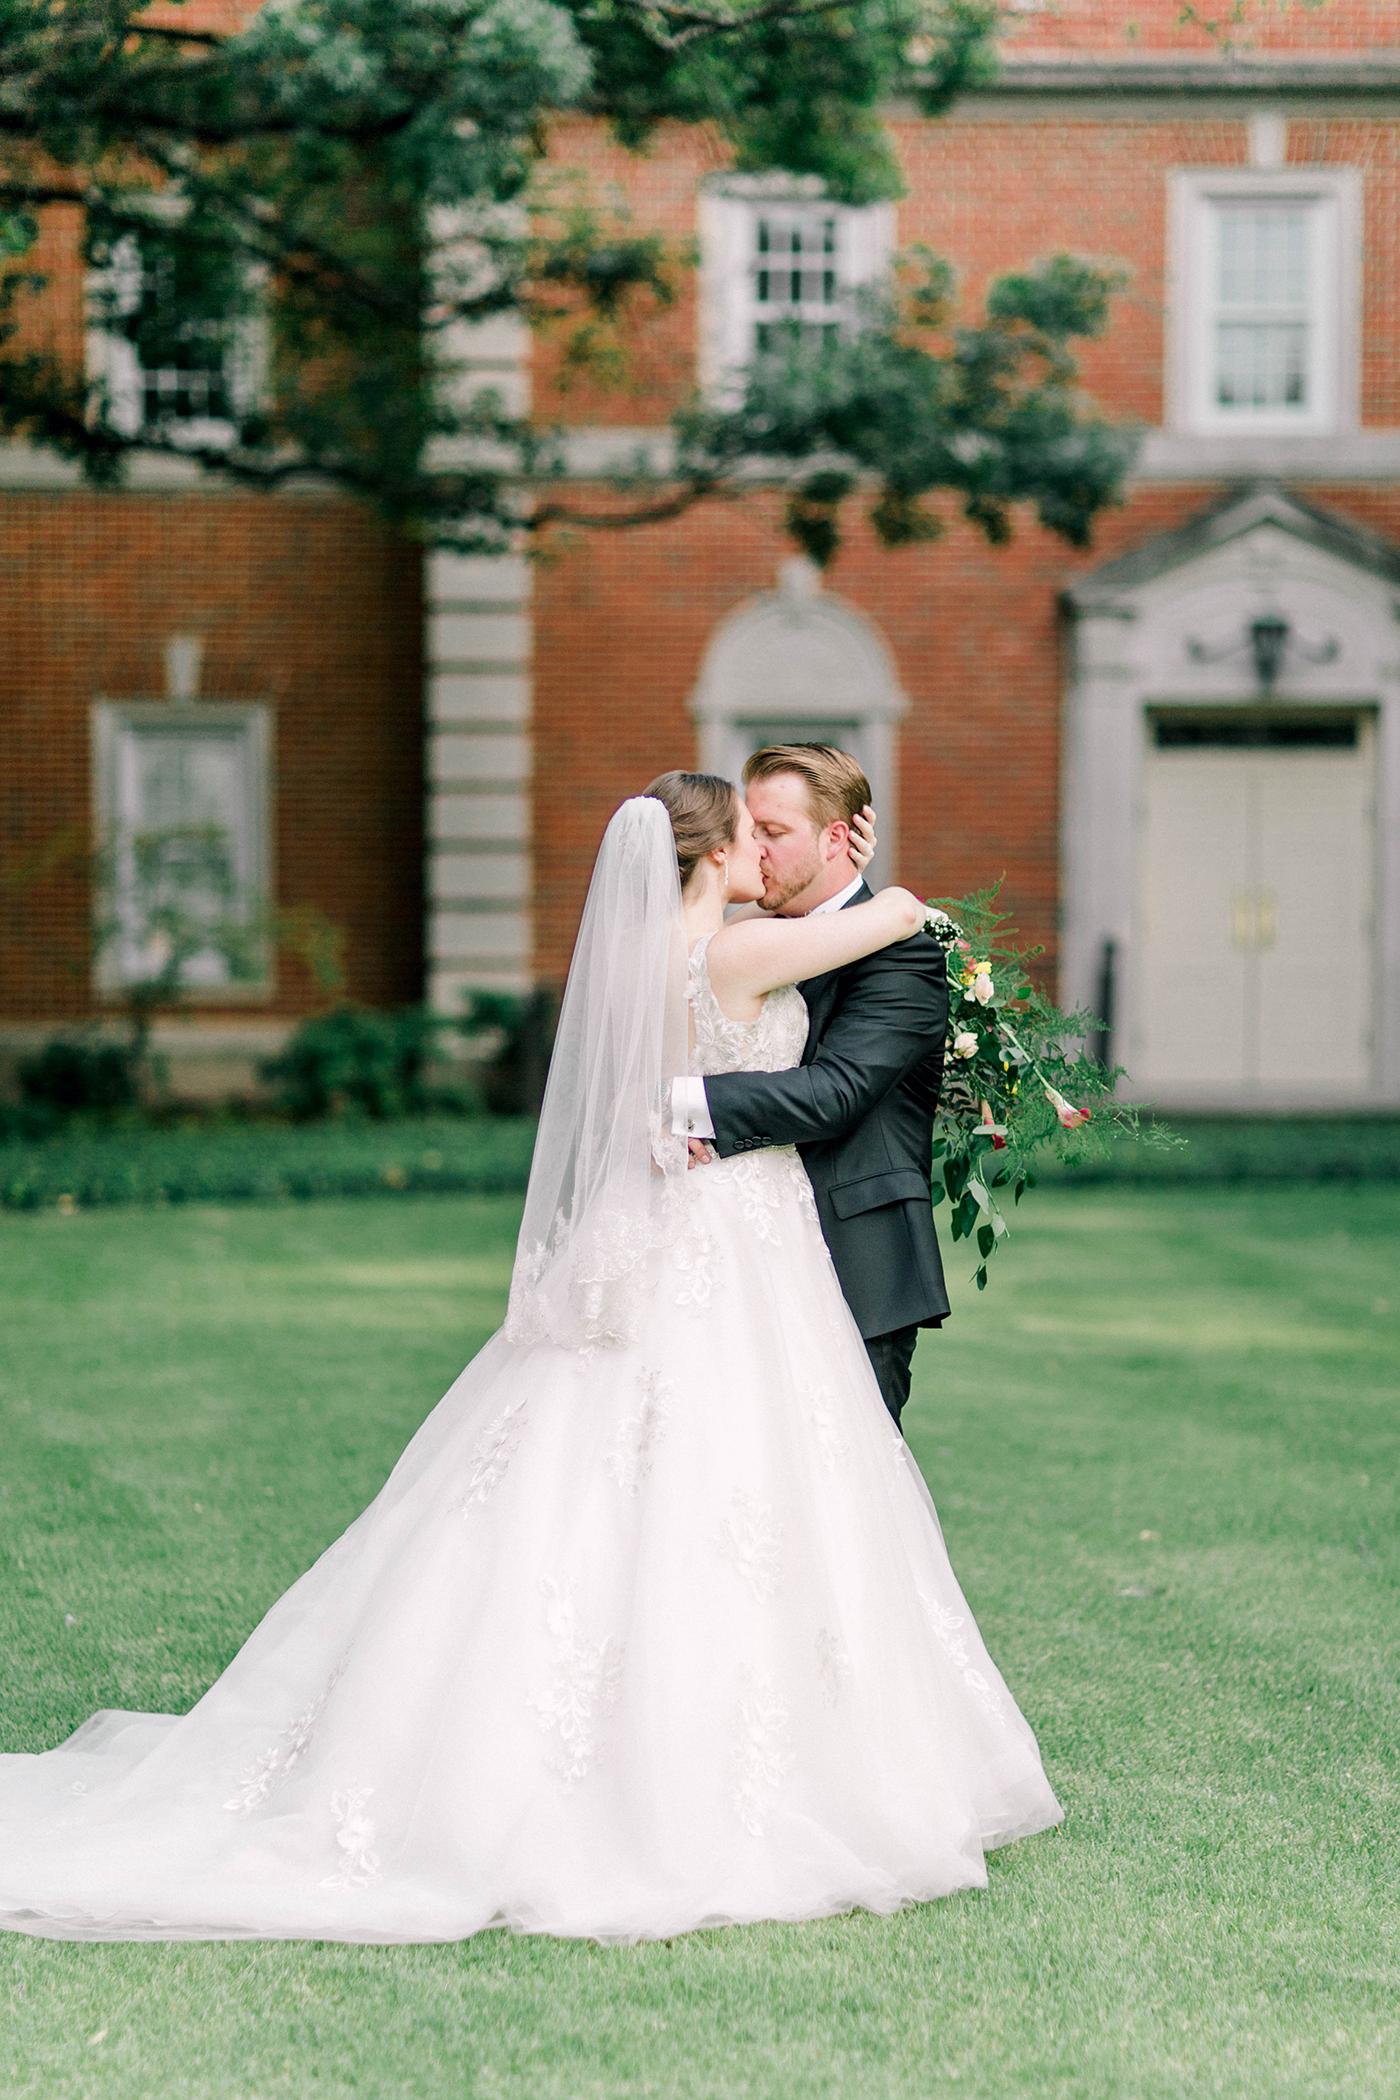 Dallas TX Wedding Planner - Allday Events - Hall on Dragon Wedding - 00023.jpg